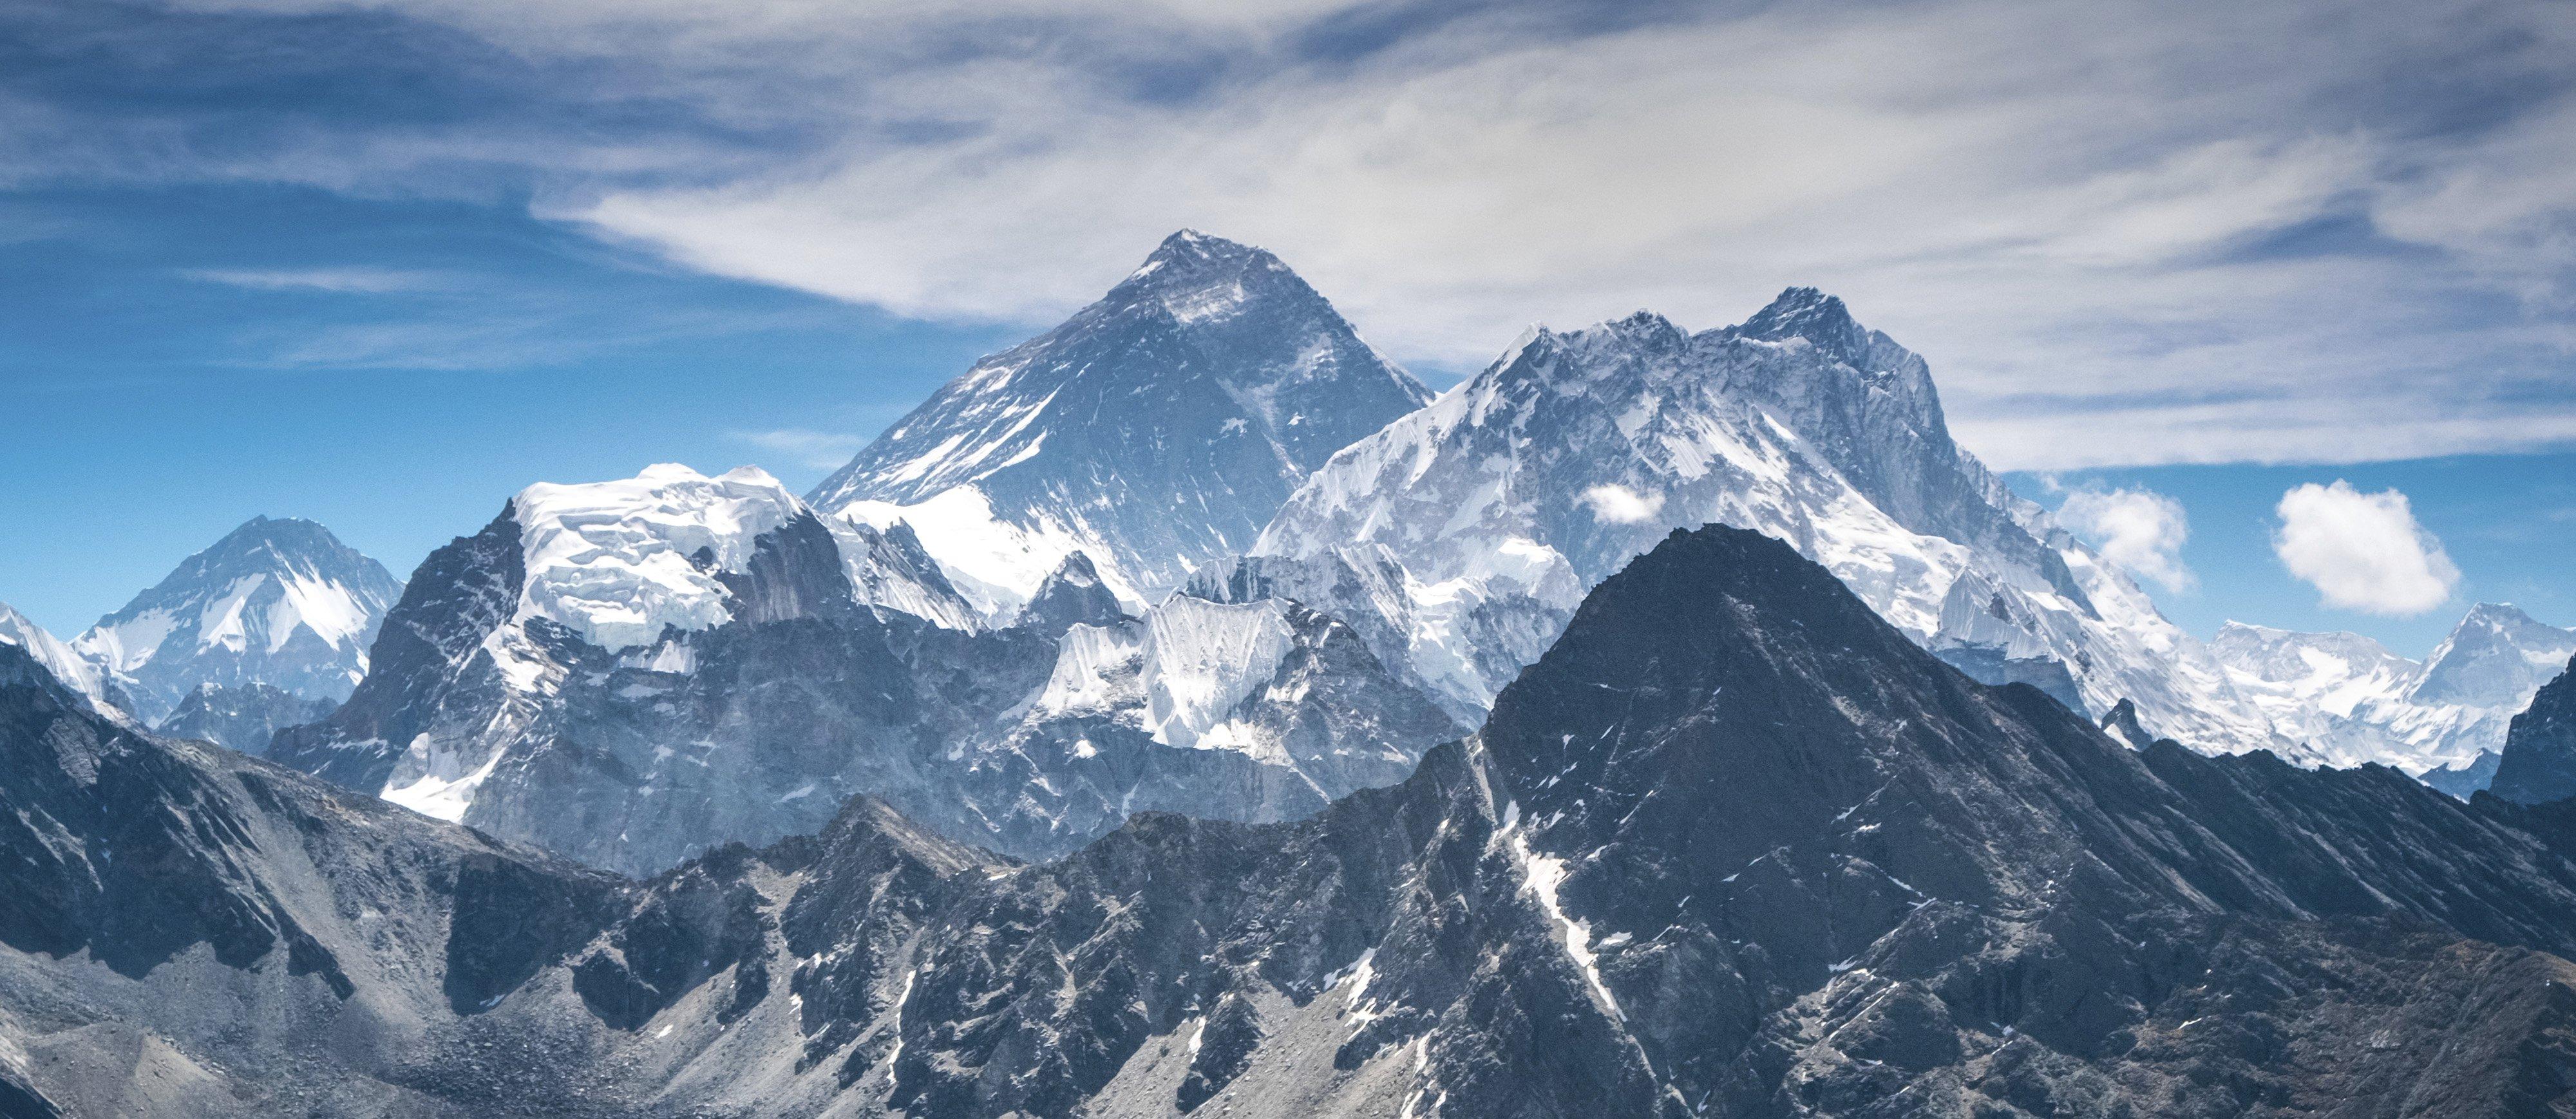 Australian Dies Descending Mt Everest